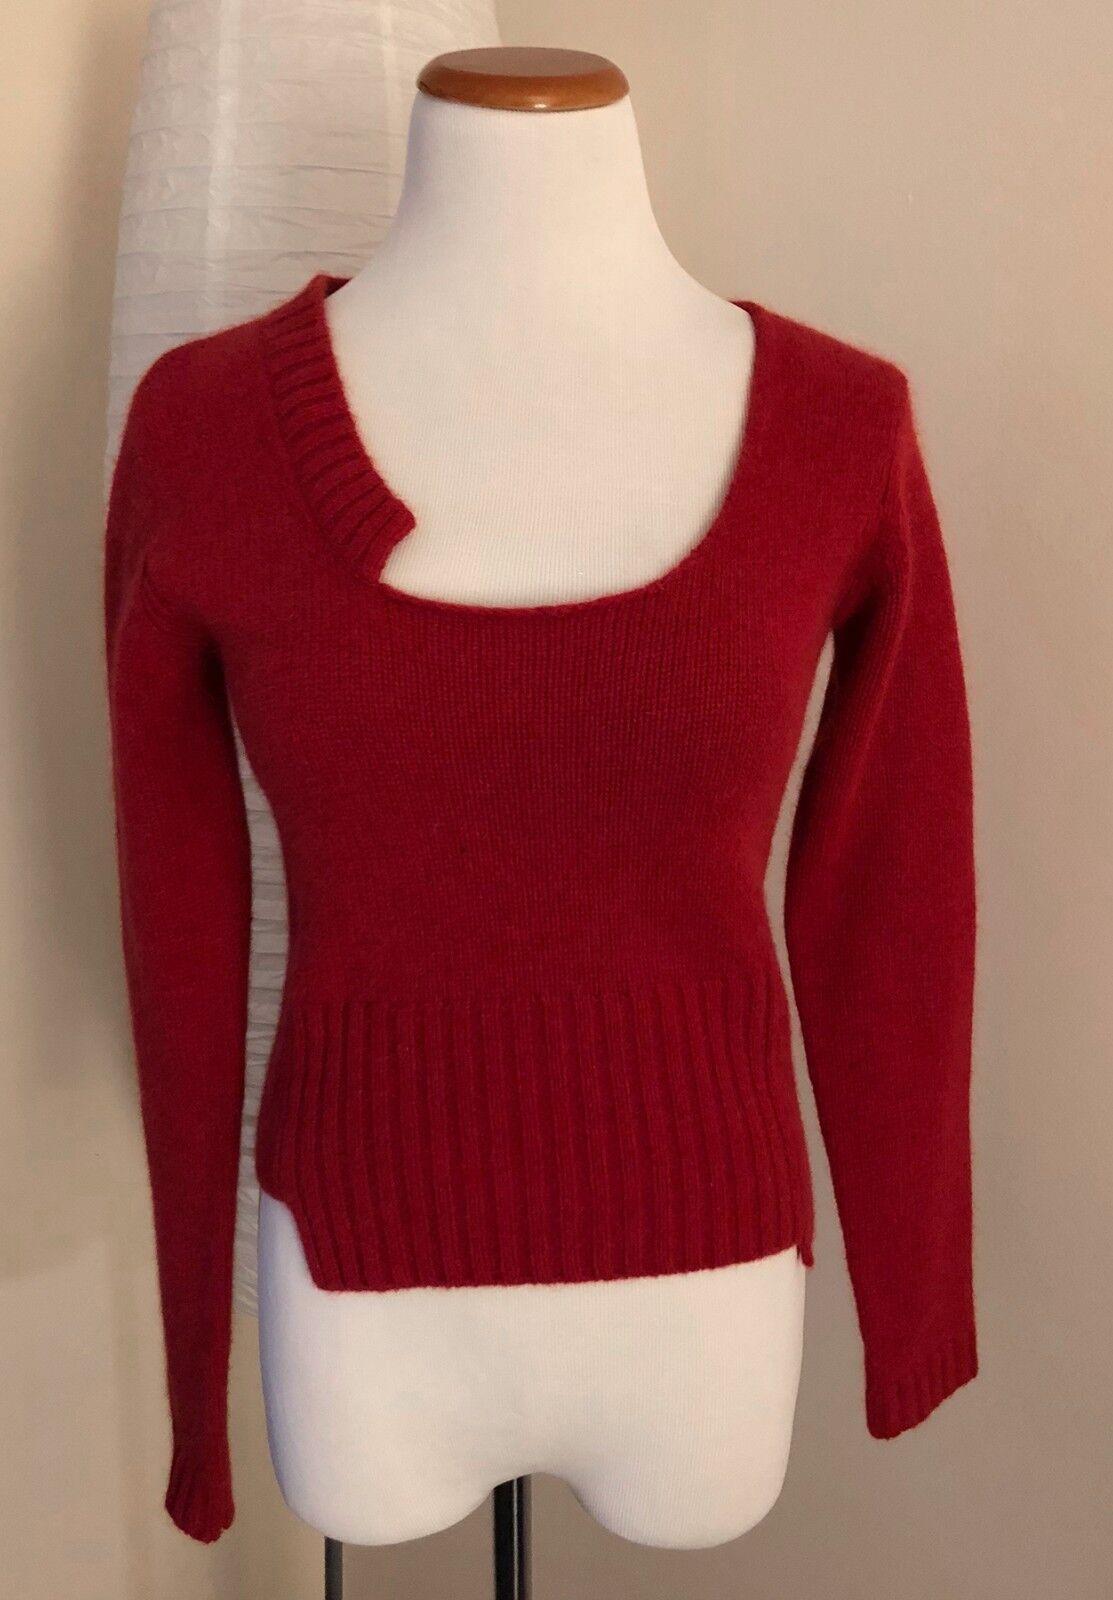 NWT  Burn n purple Maroon Asymmetrical Angora & Wool Sweater - XS Orig.